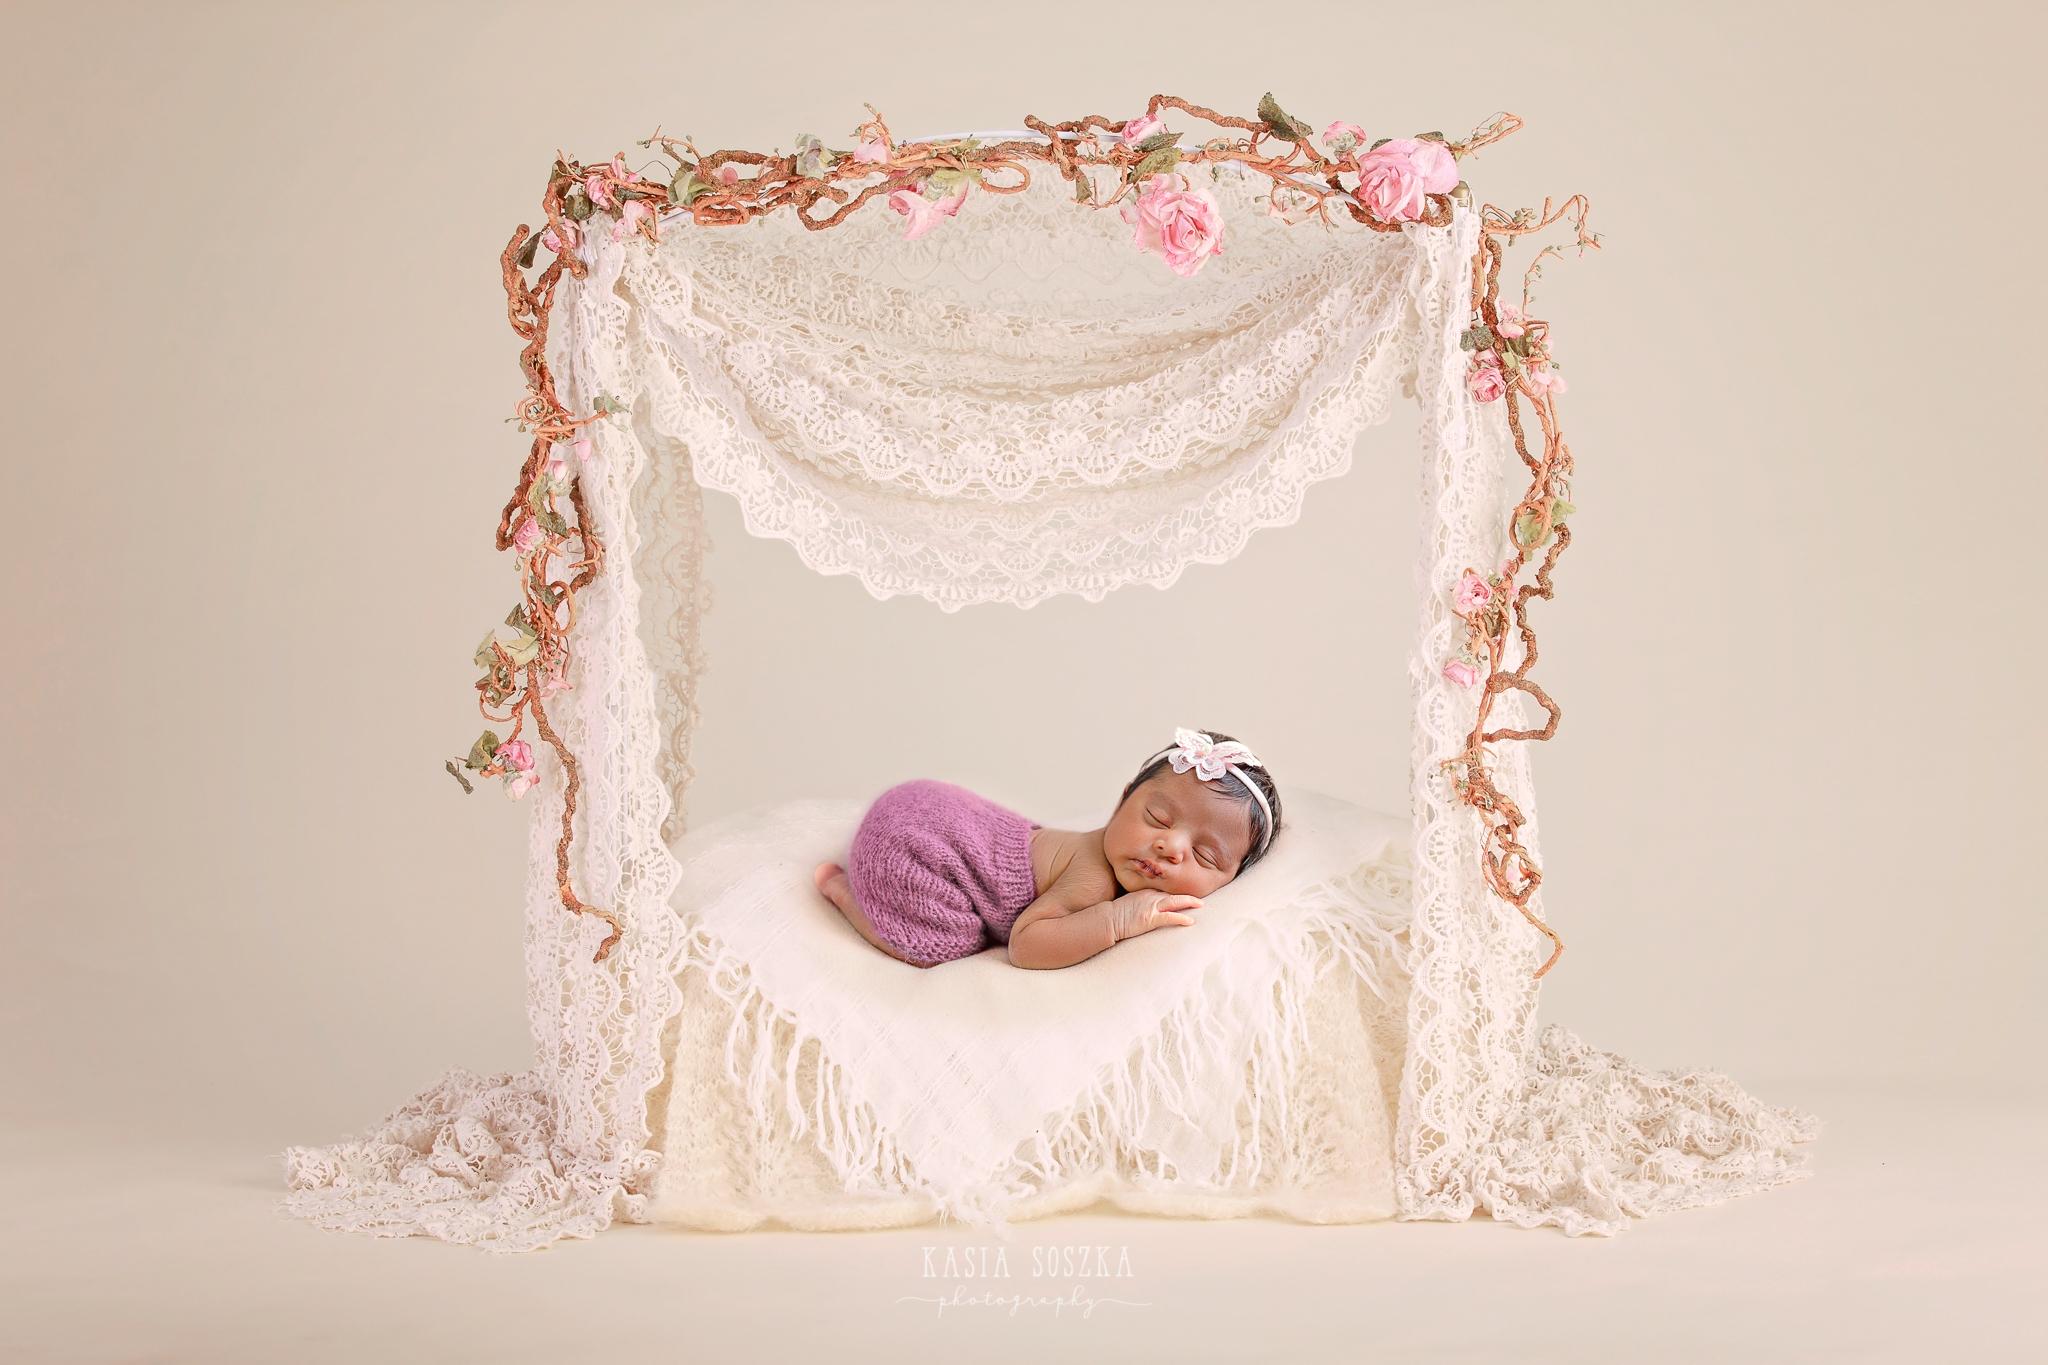 Newborn photography Leeds-Bradford-York-Harrogate: newborn baby girl sleeping on a vintage poster bed